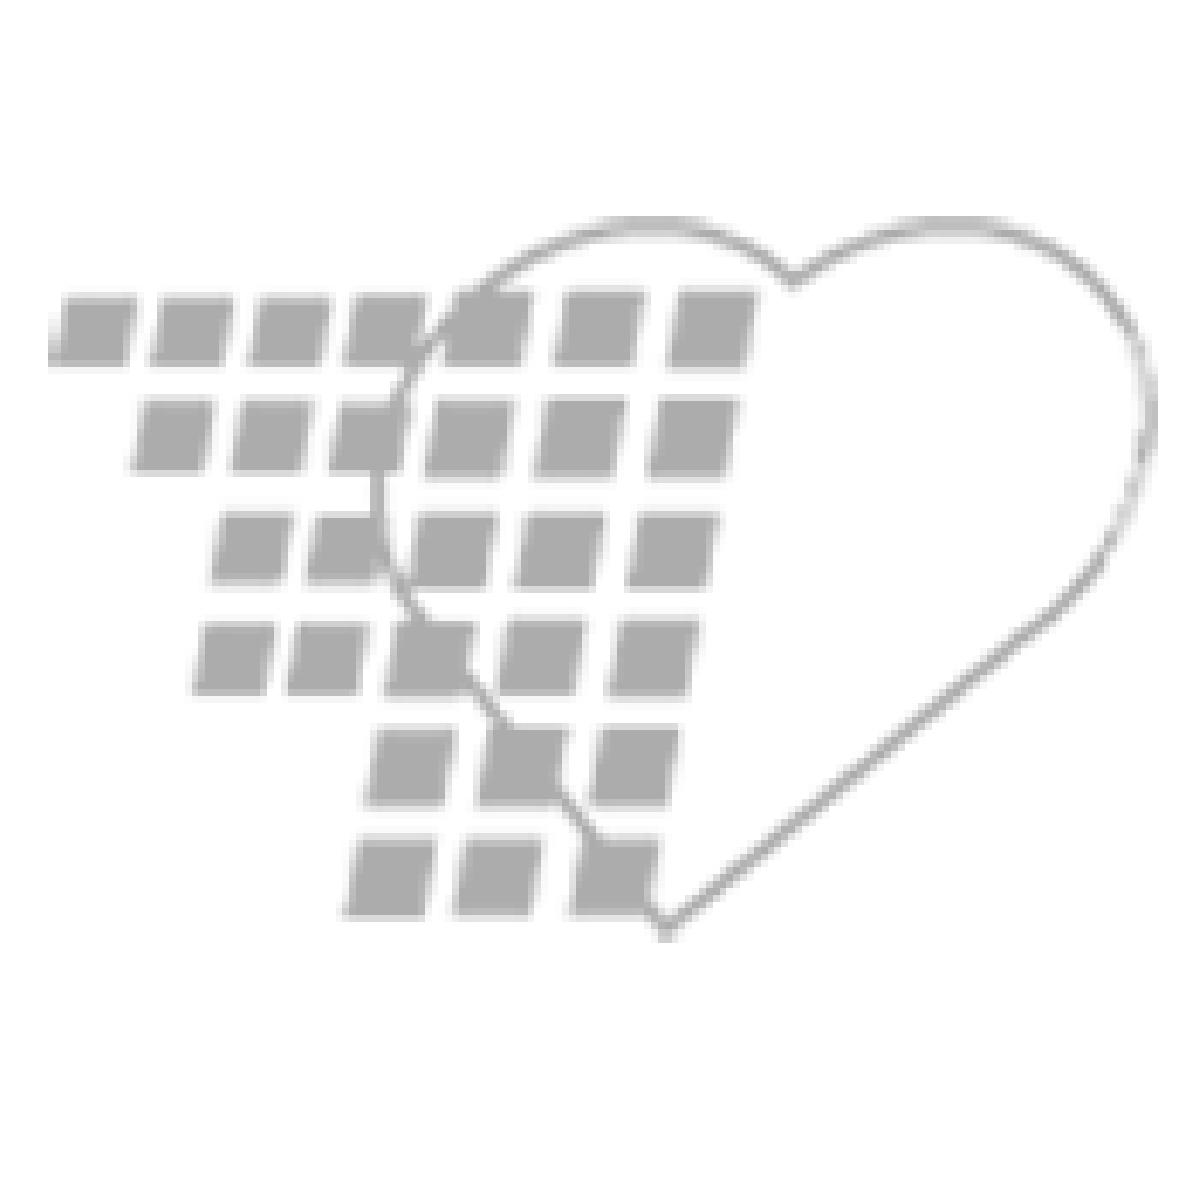 06-93-1040-500ML - Demo Dose® Lactatd Ringr  's 5% Dextros IV Fluids 500mL